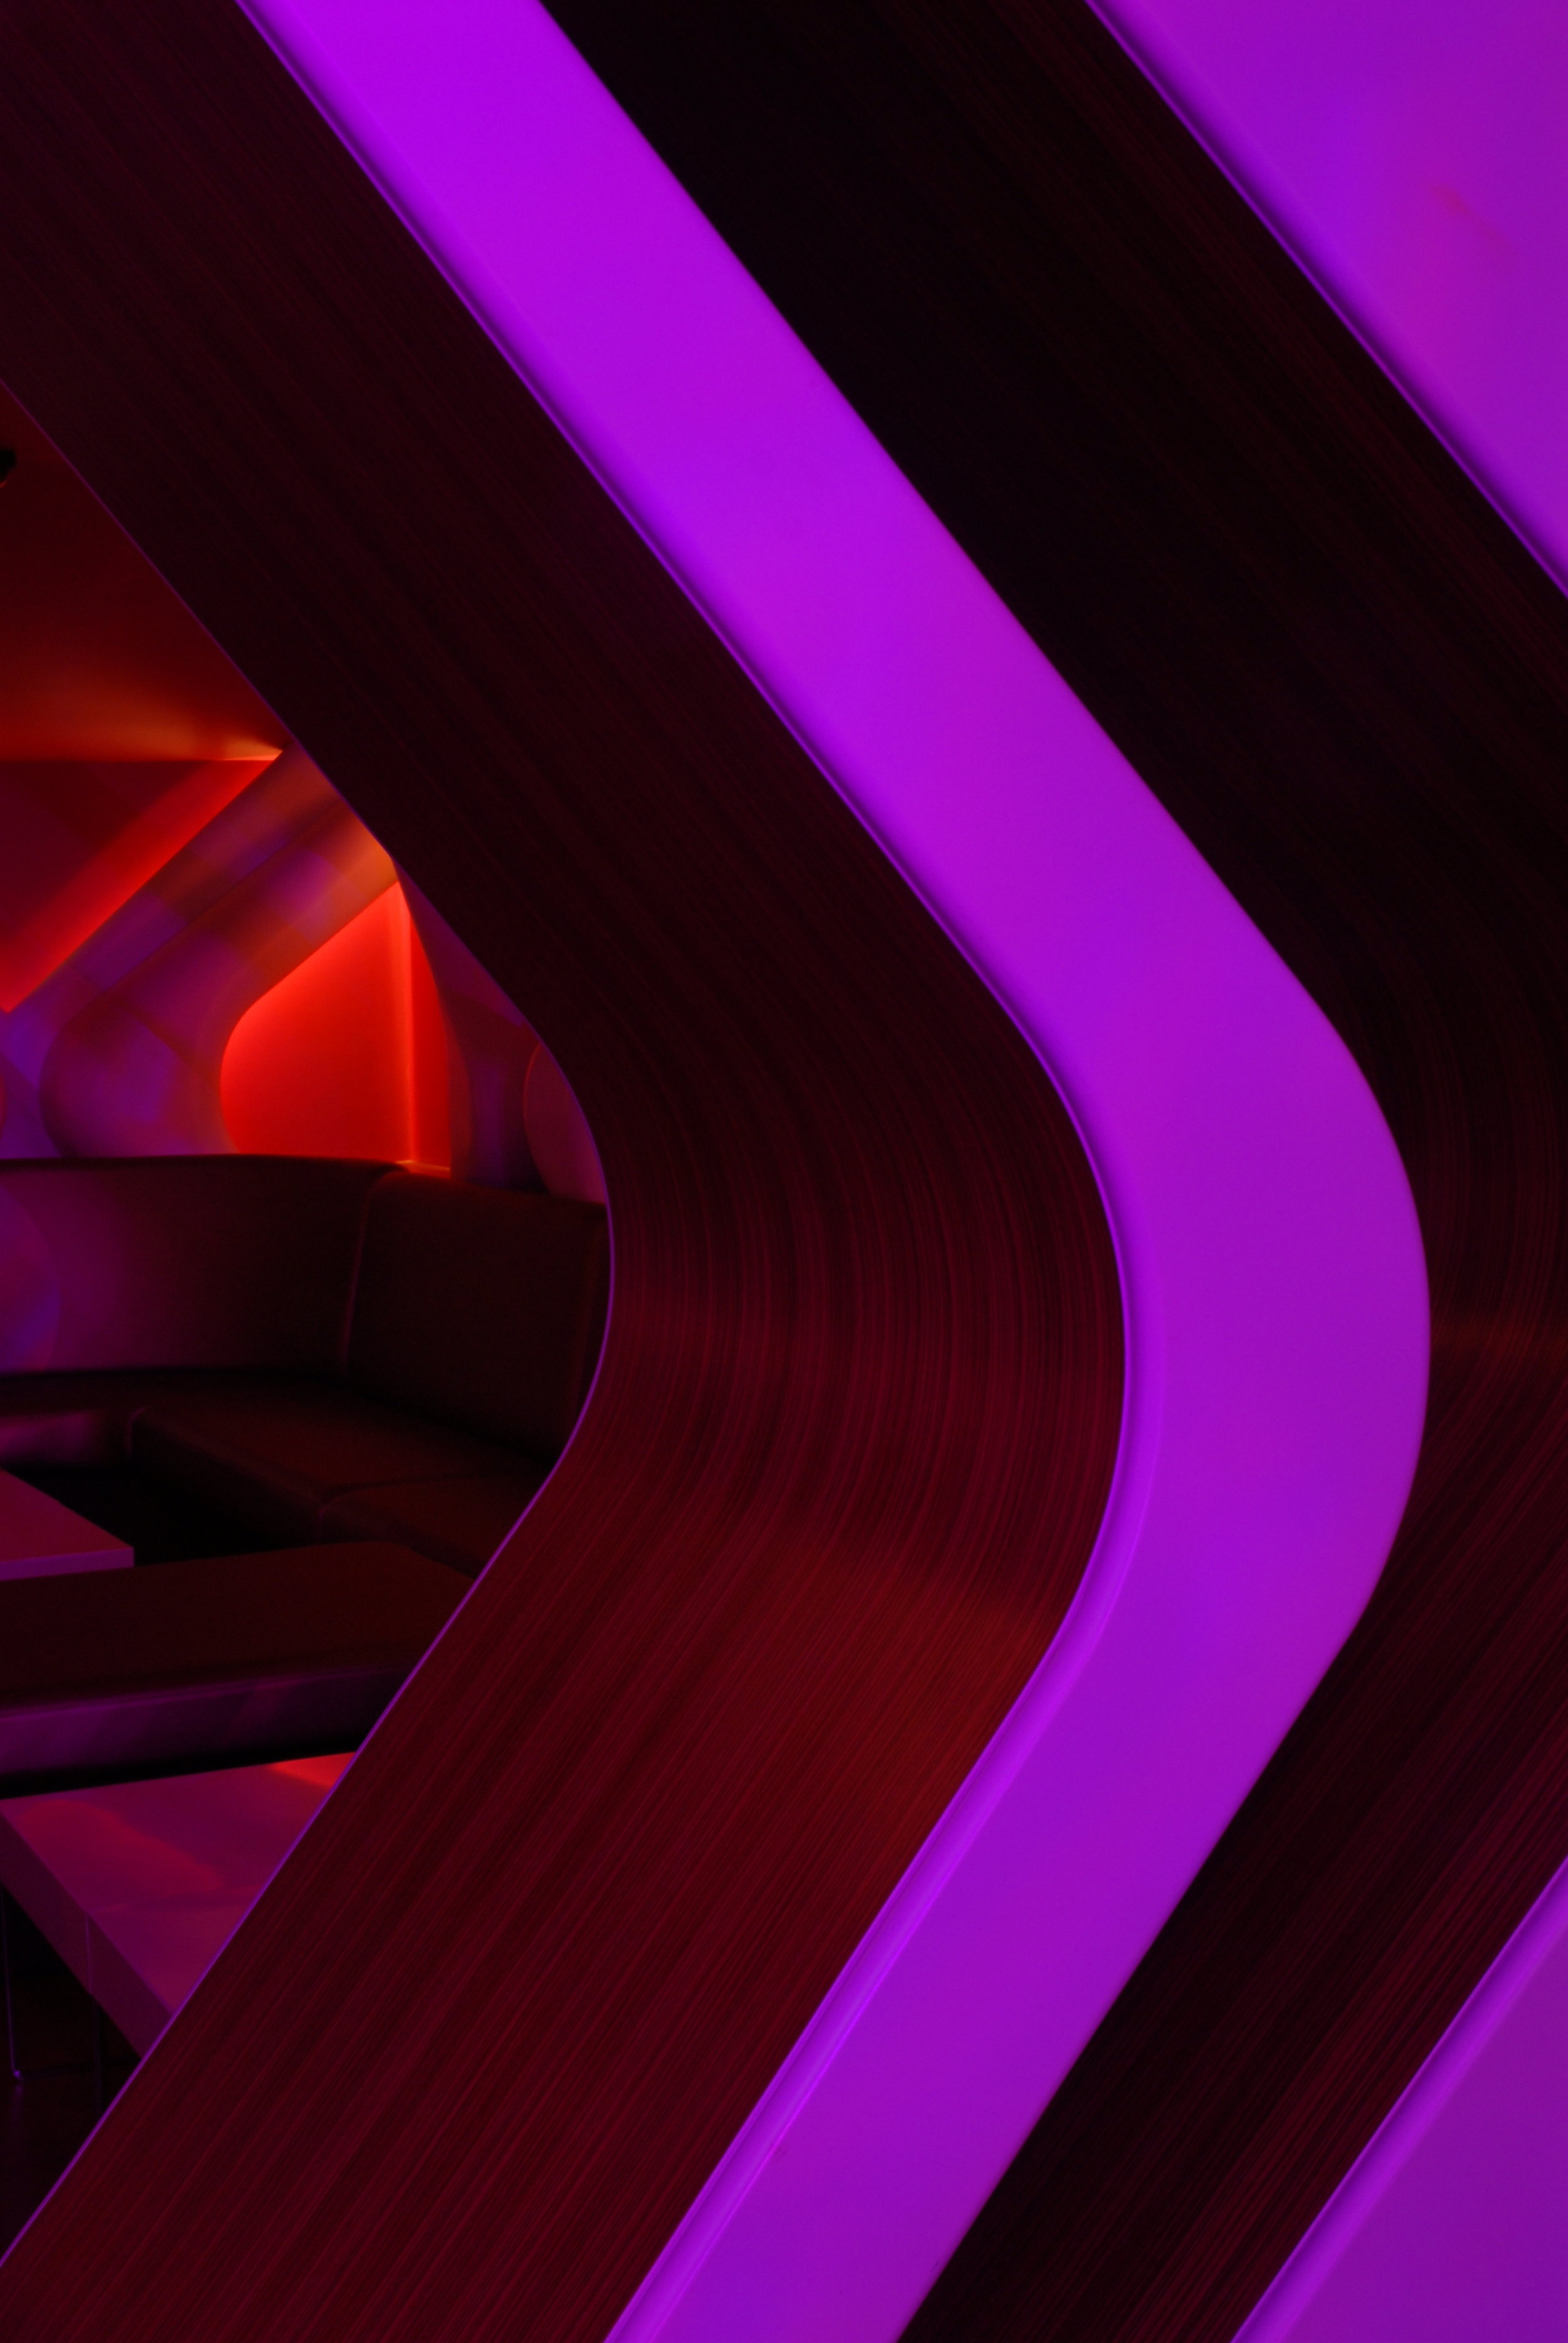 studio-saint-bars-and-restaurants-lotus-lounge-washington-dc-8